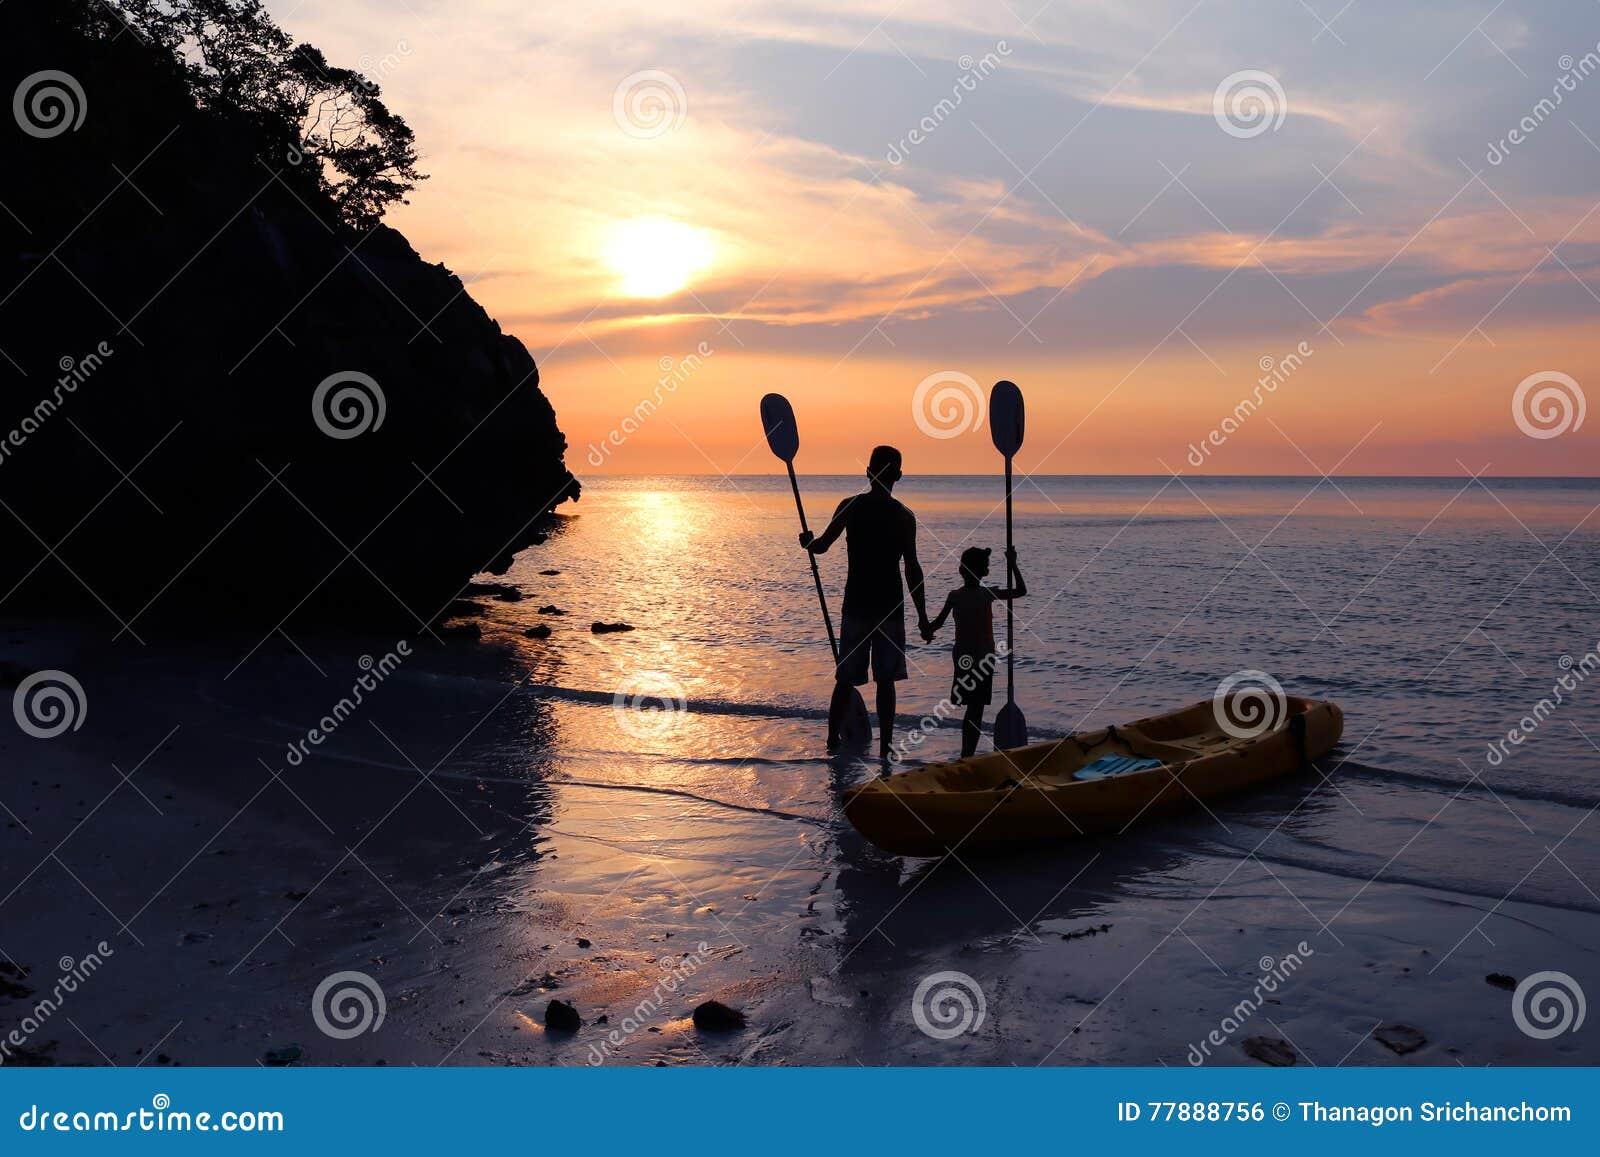 Hombre E Hija Kayaking En La Playa Foto de archivo